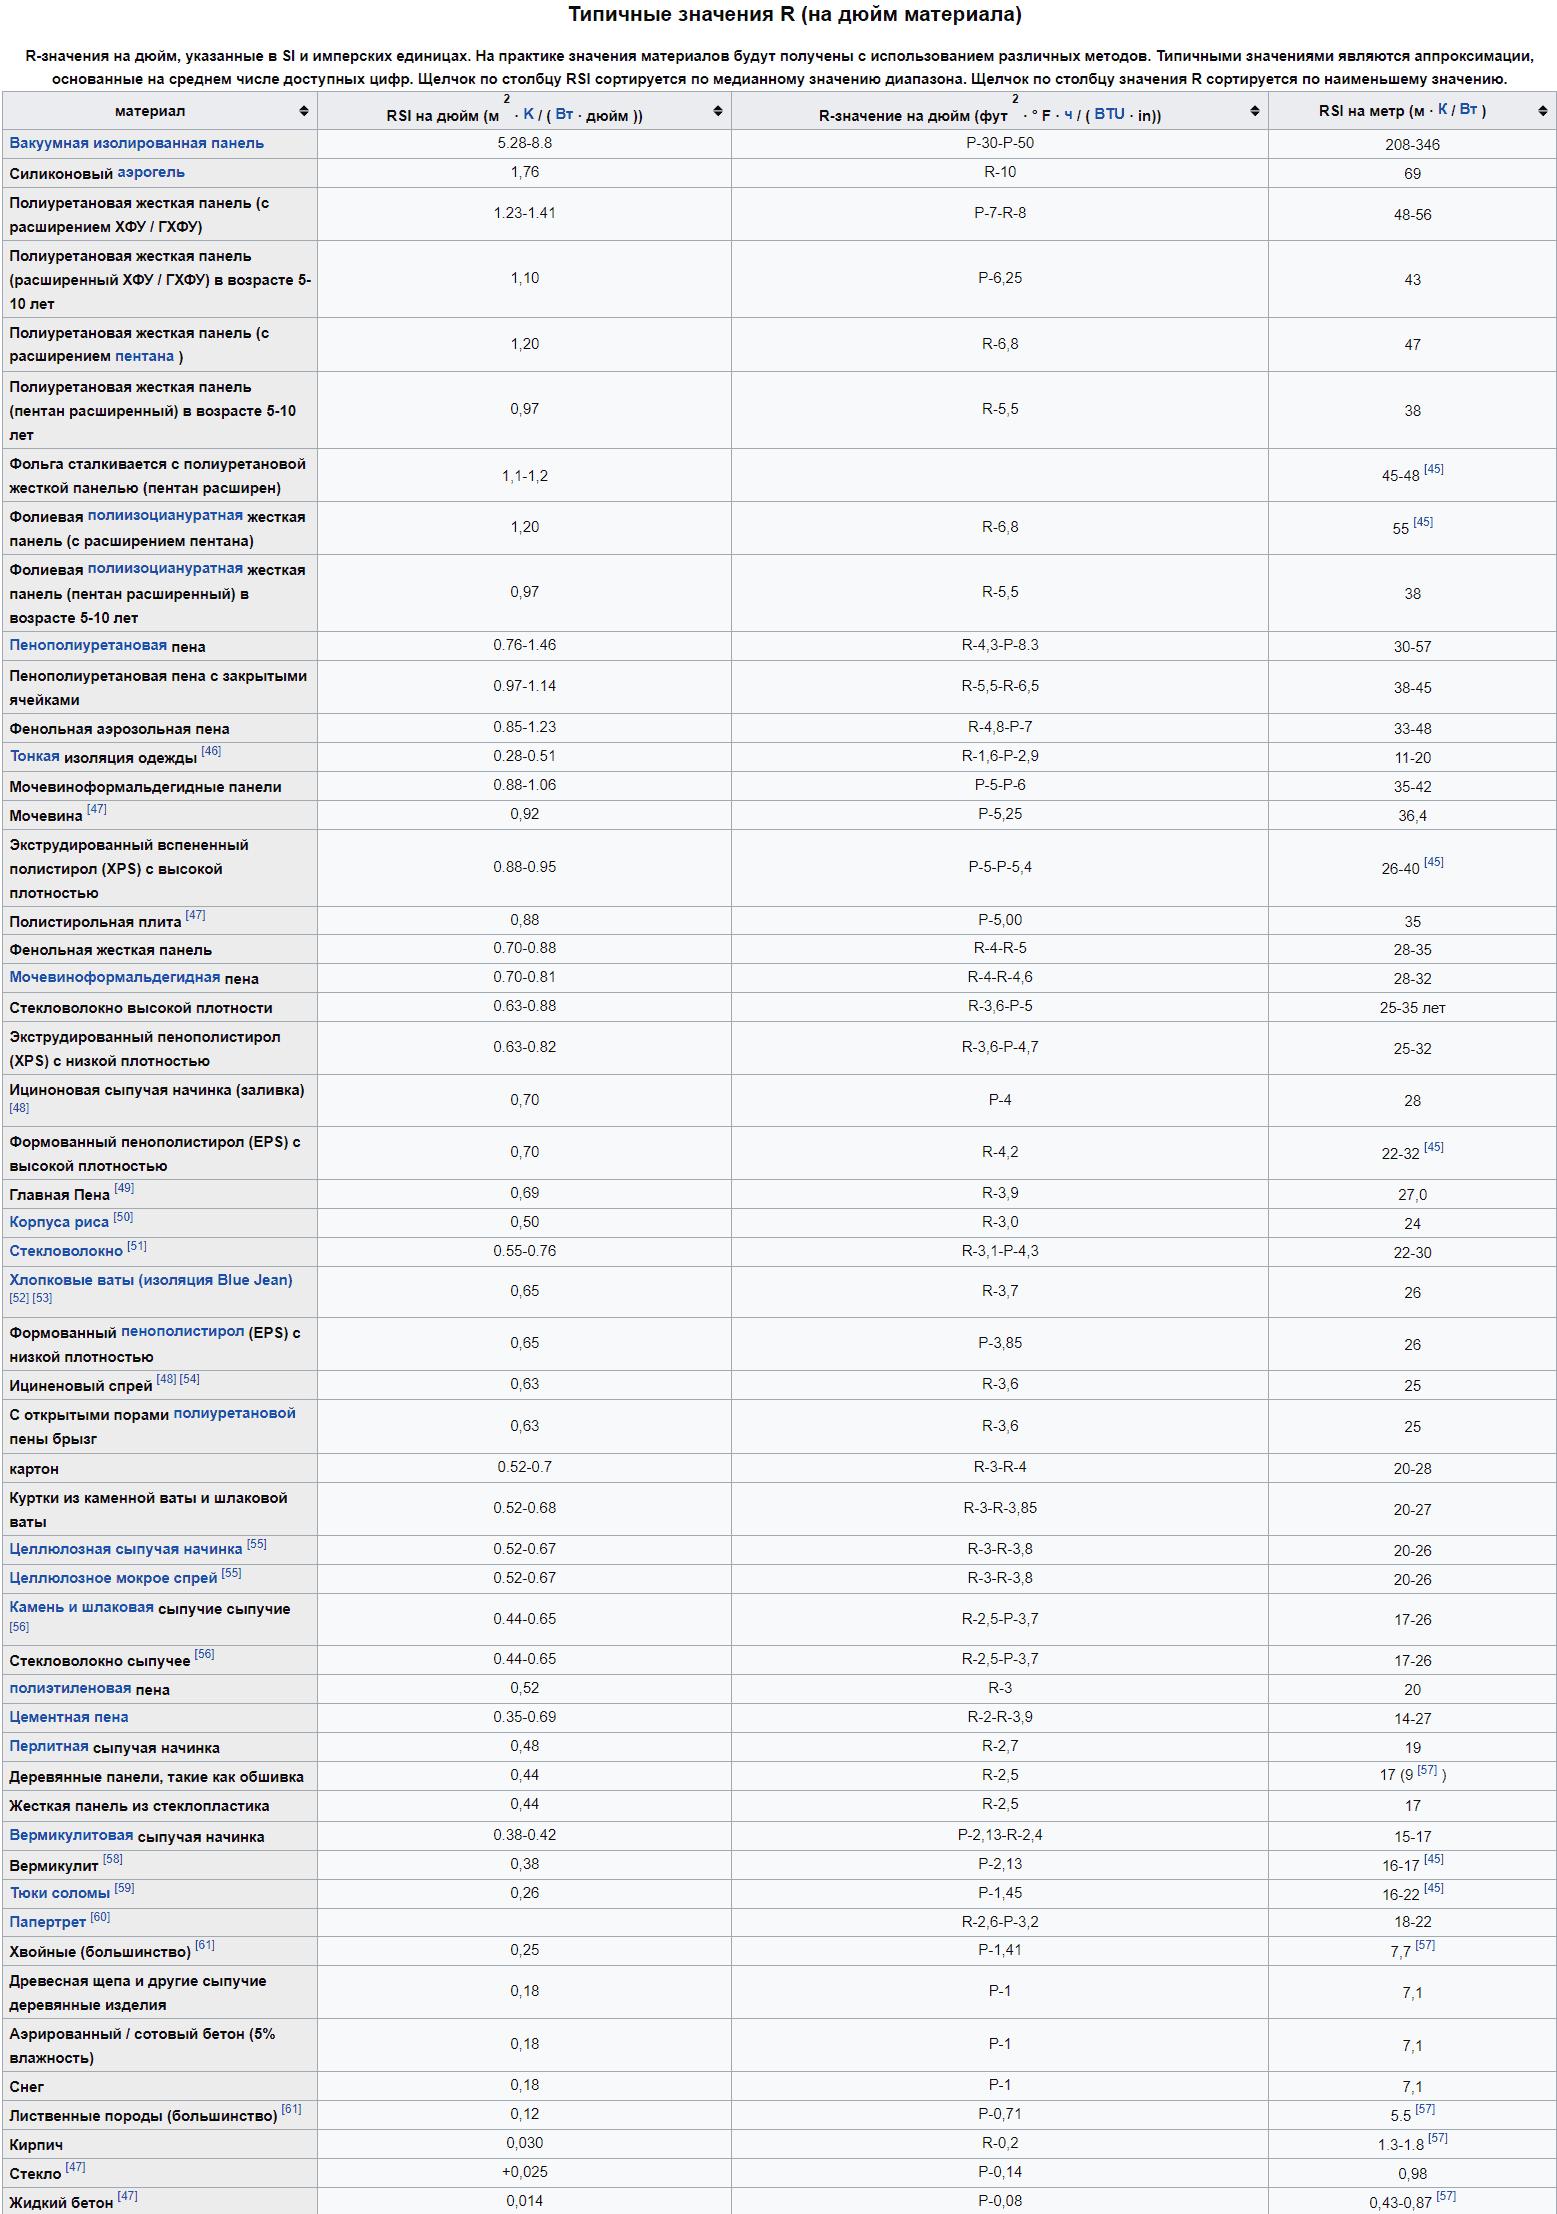 R-value утеплителей